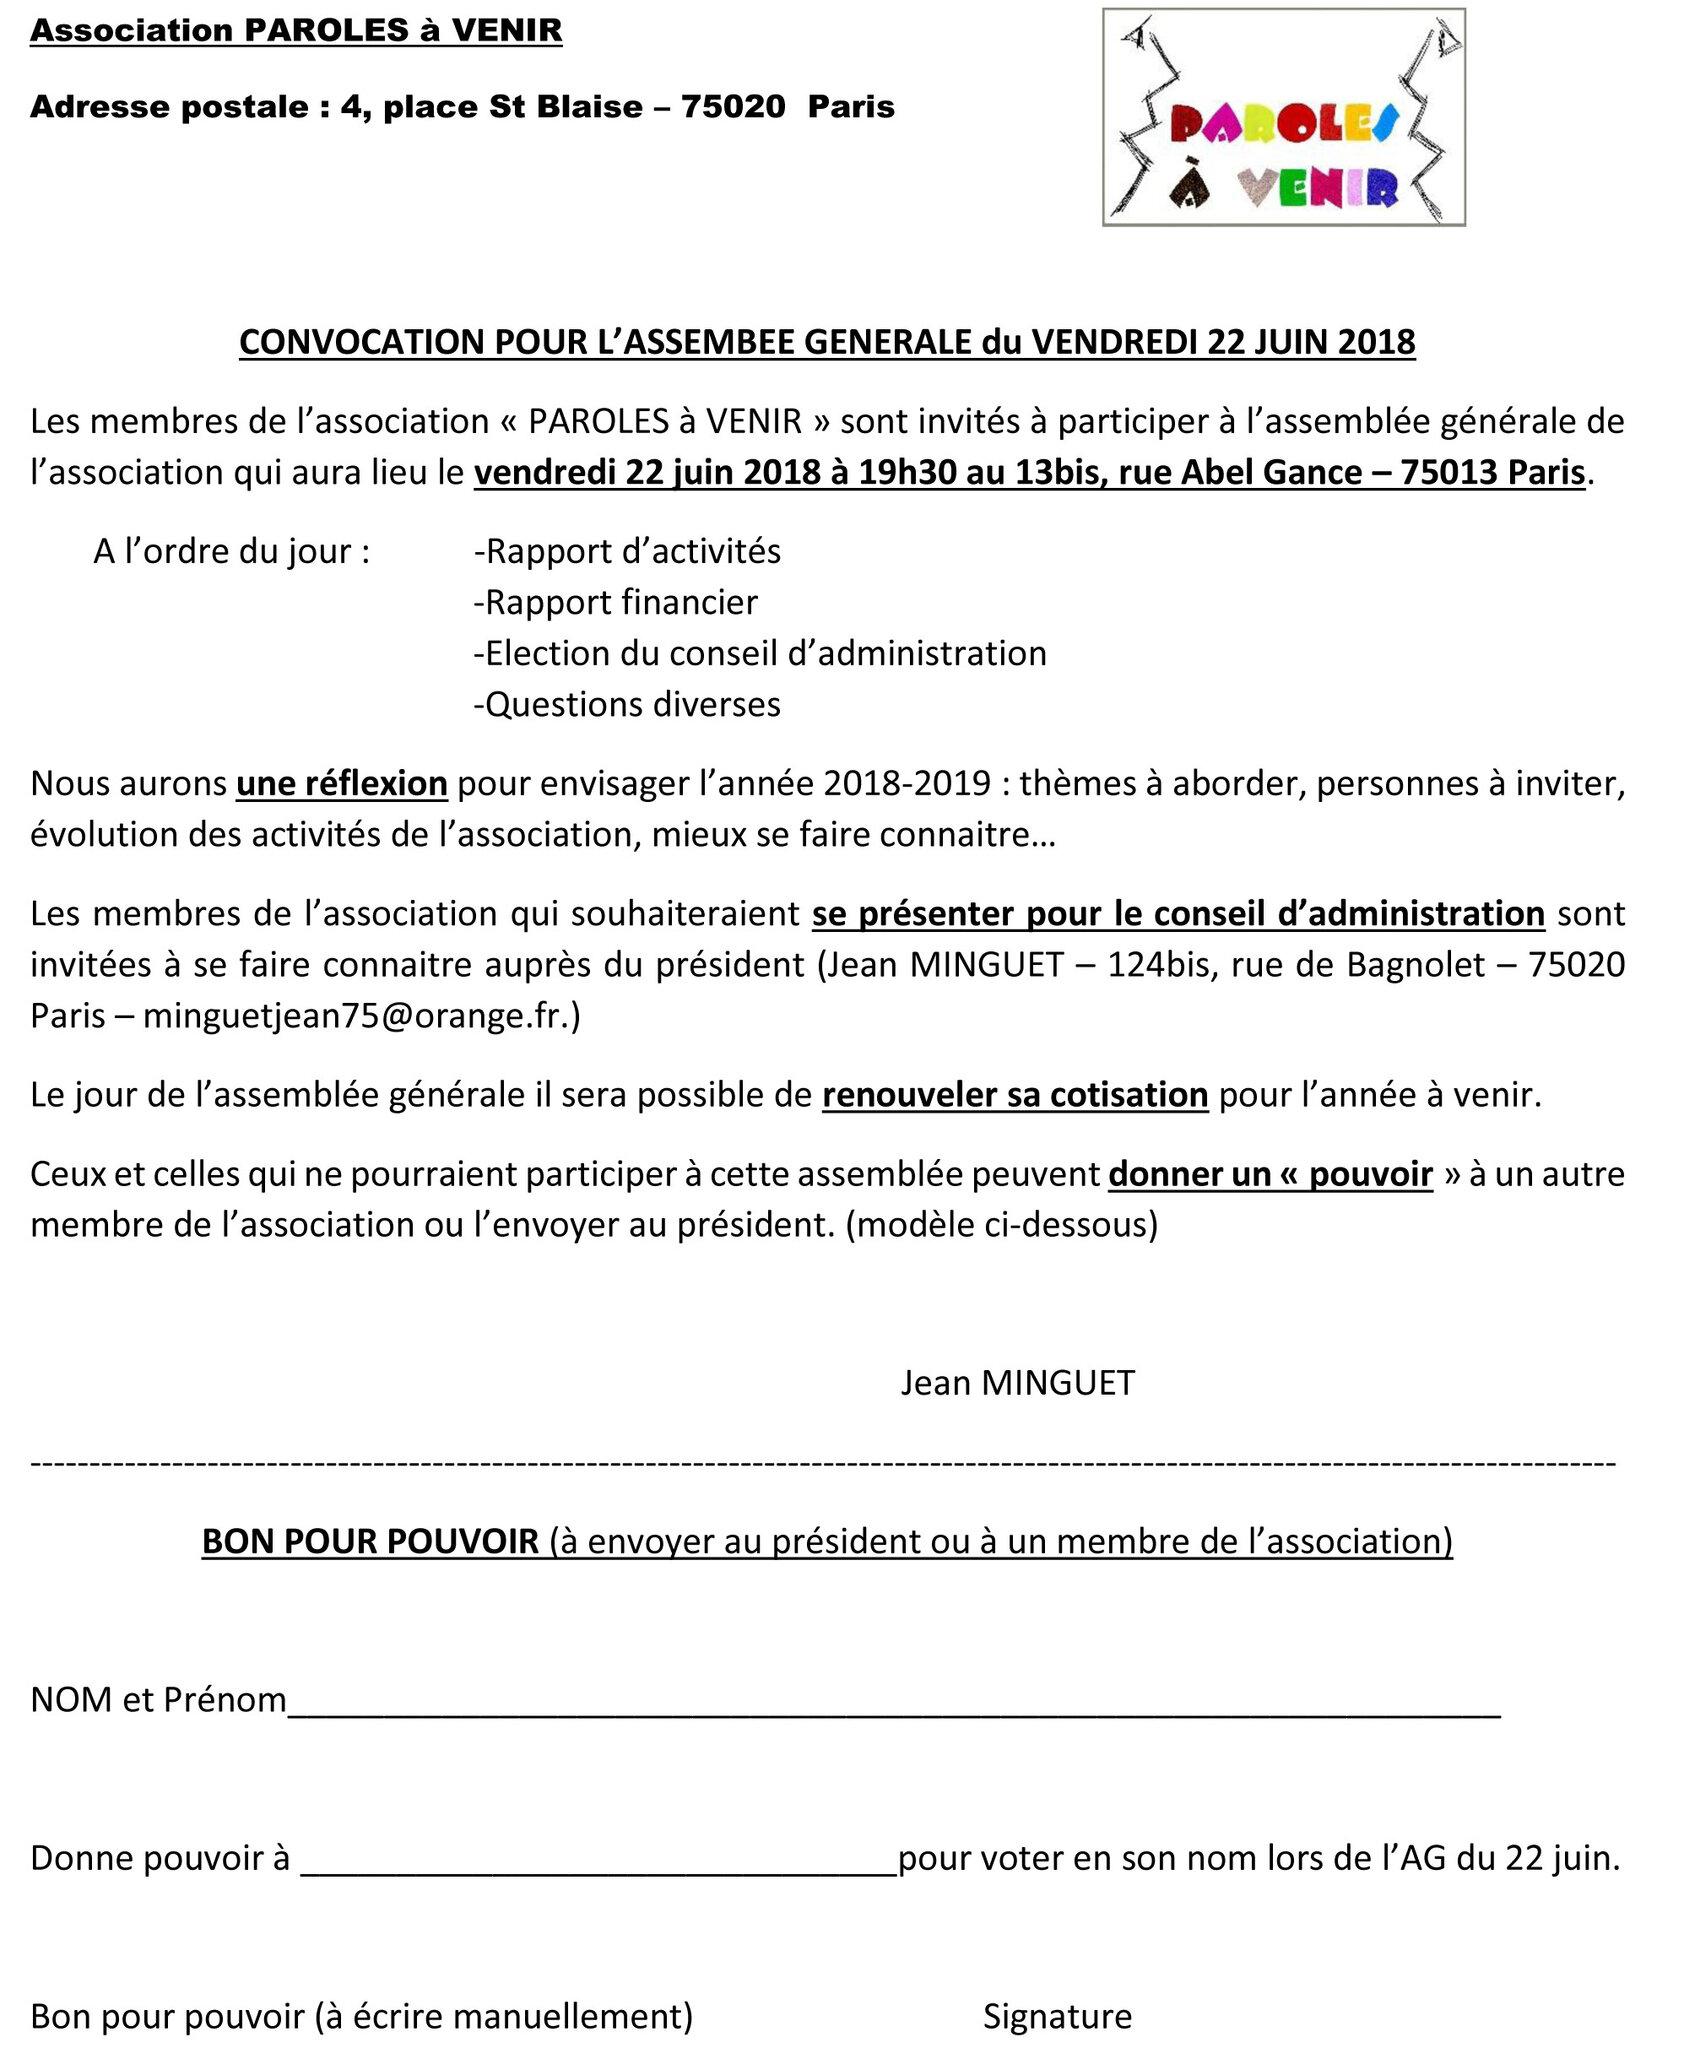 Convocation A L Assemblee Generale Du 22 Juin 2018 Paroles A Venir